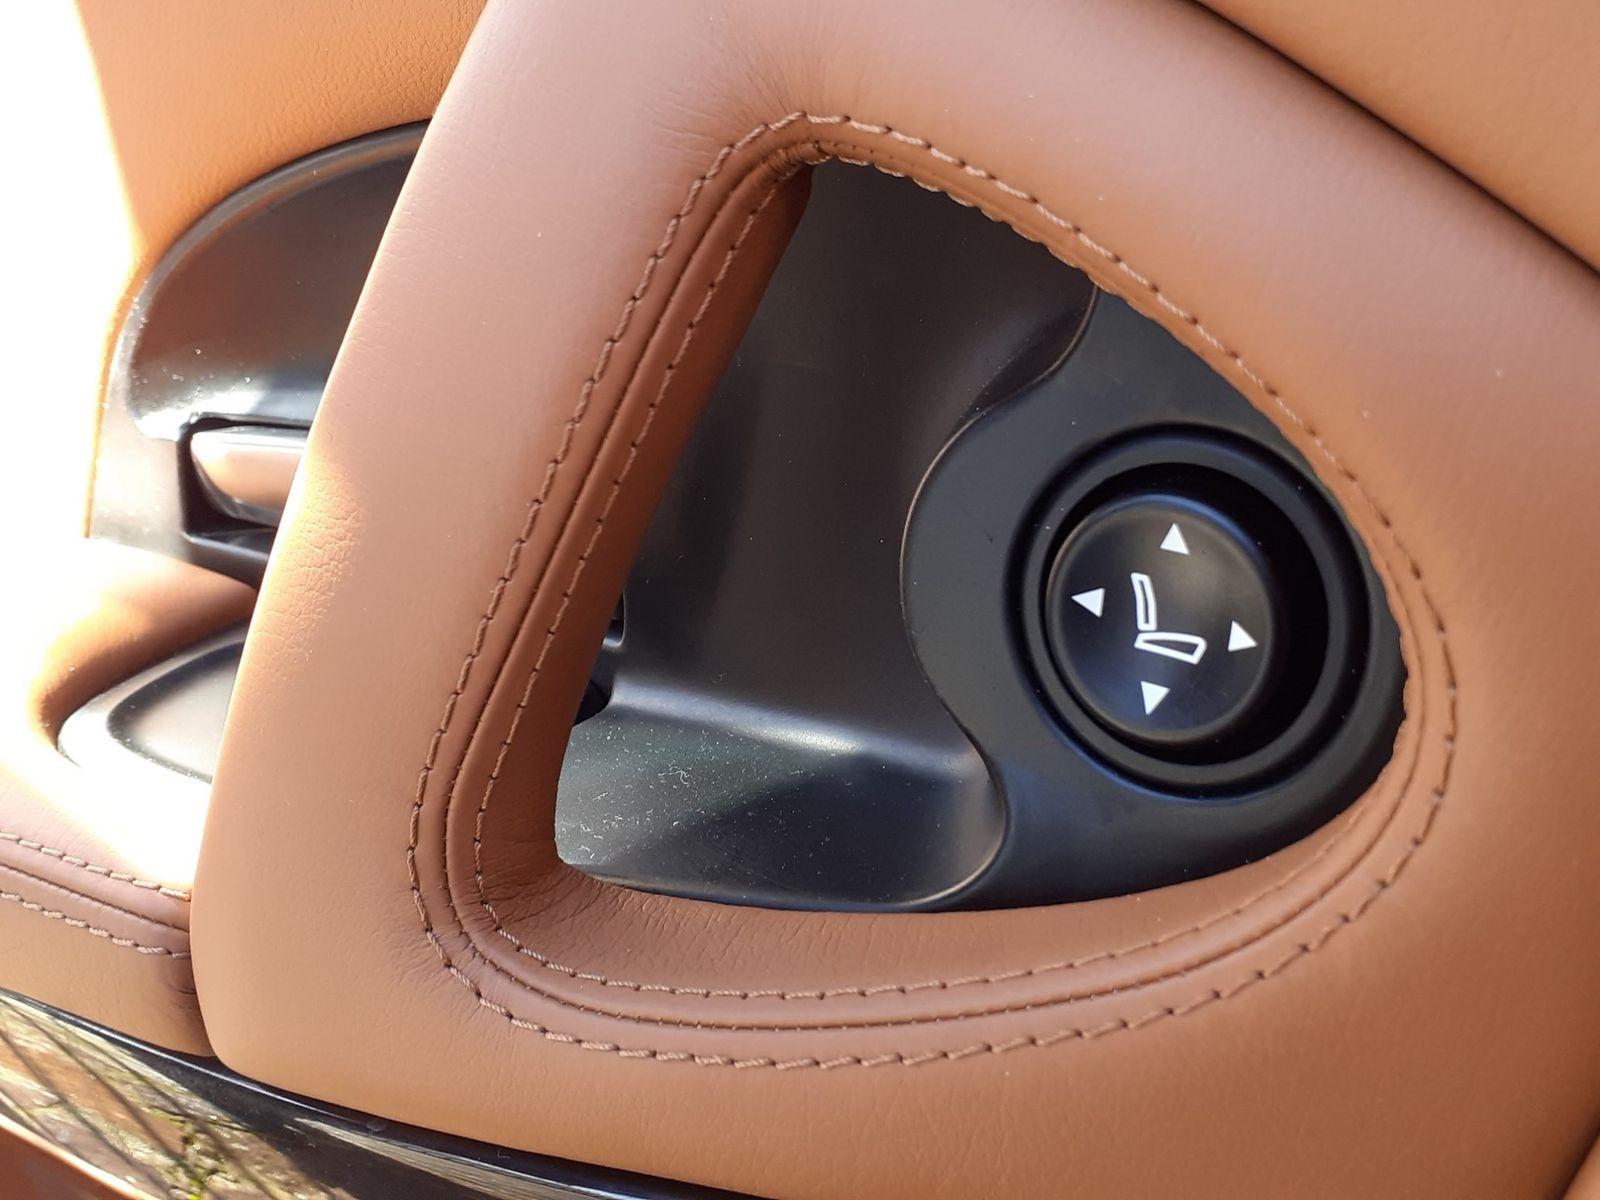 Maserati Quattroporte 4.2 V8 Duoselect Executive GT. Unica.